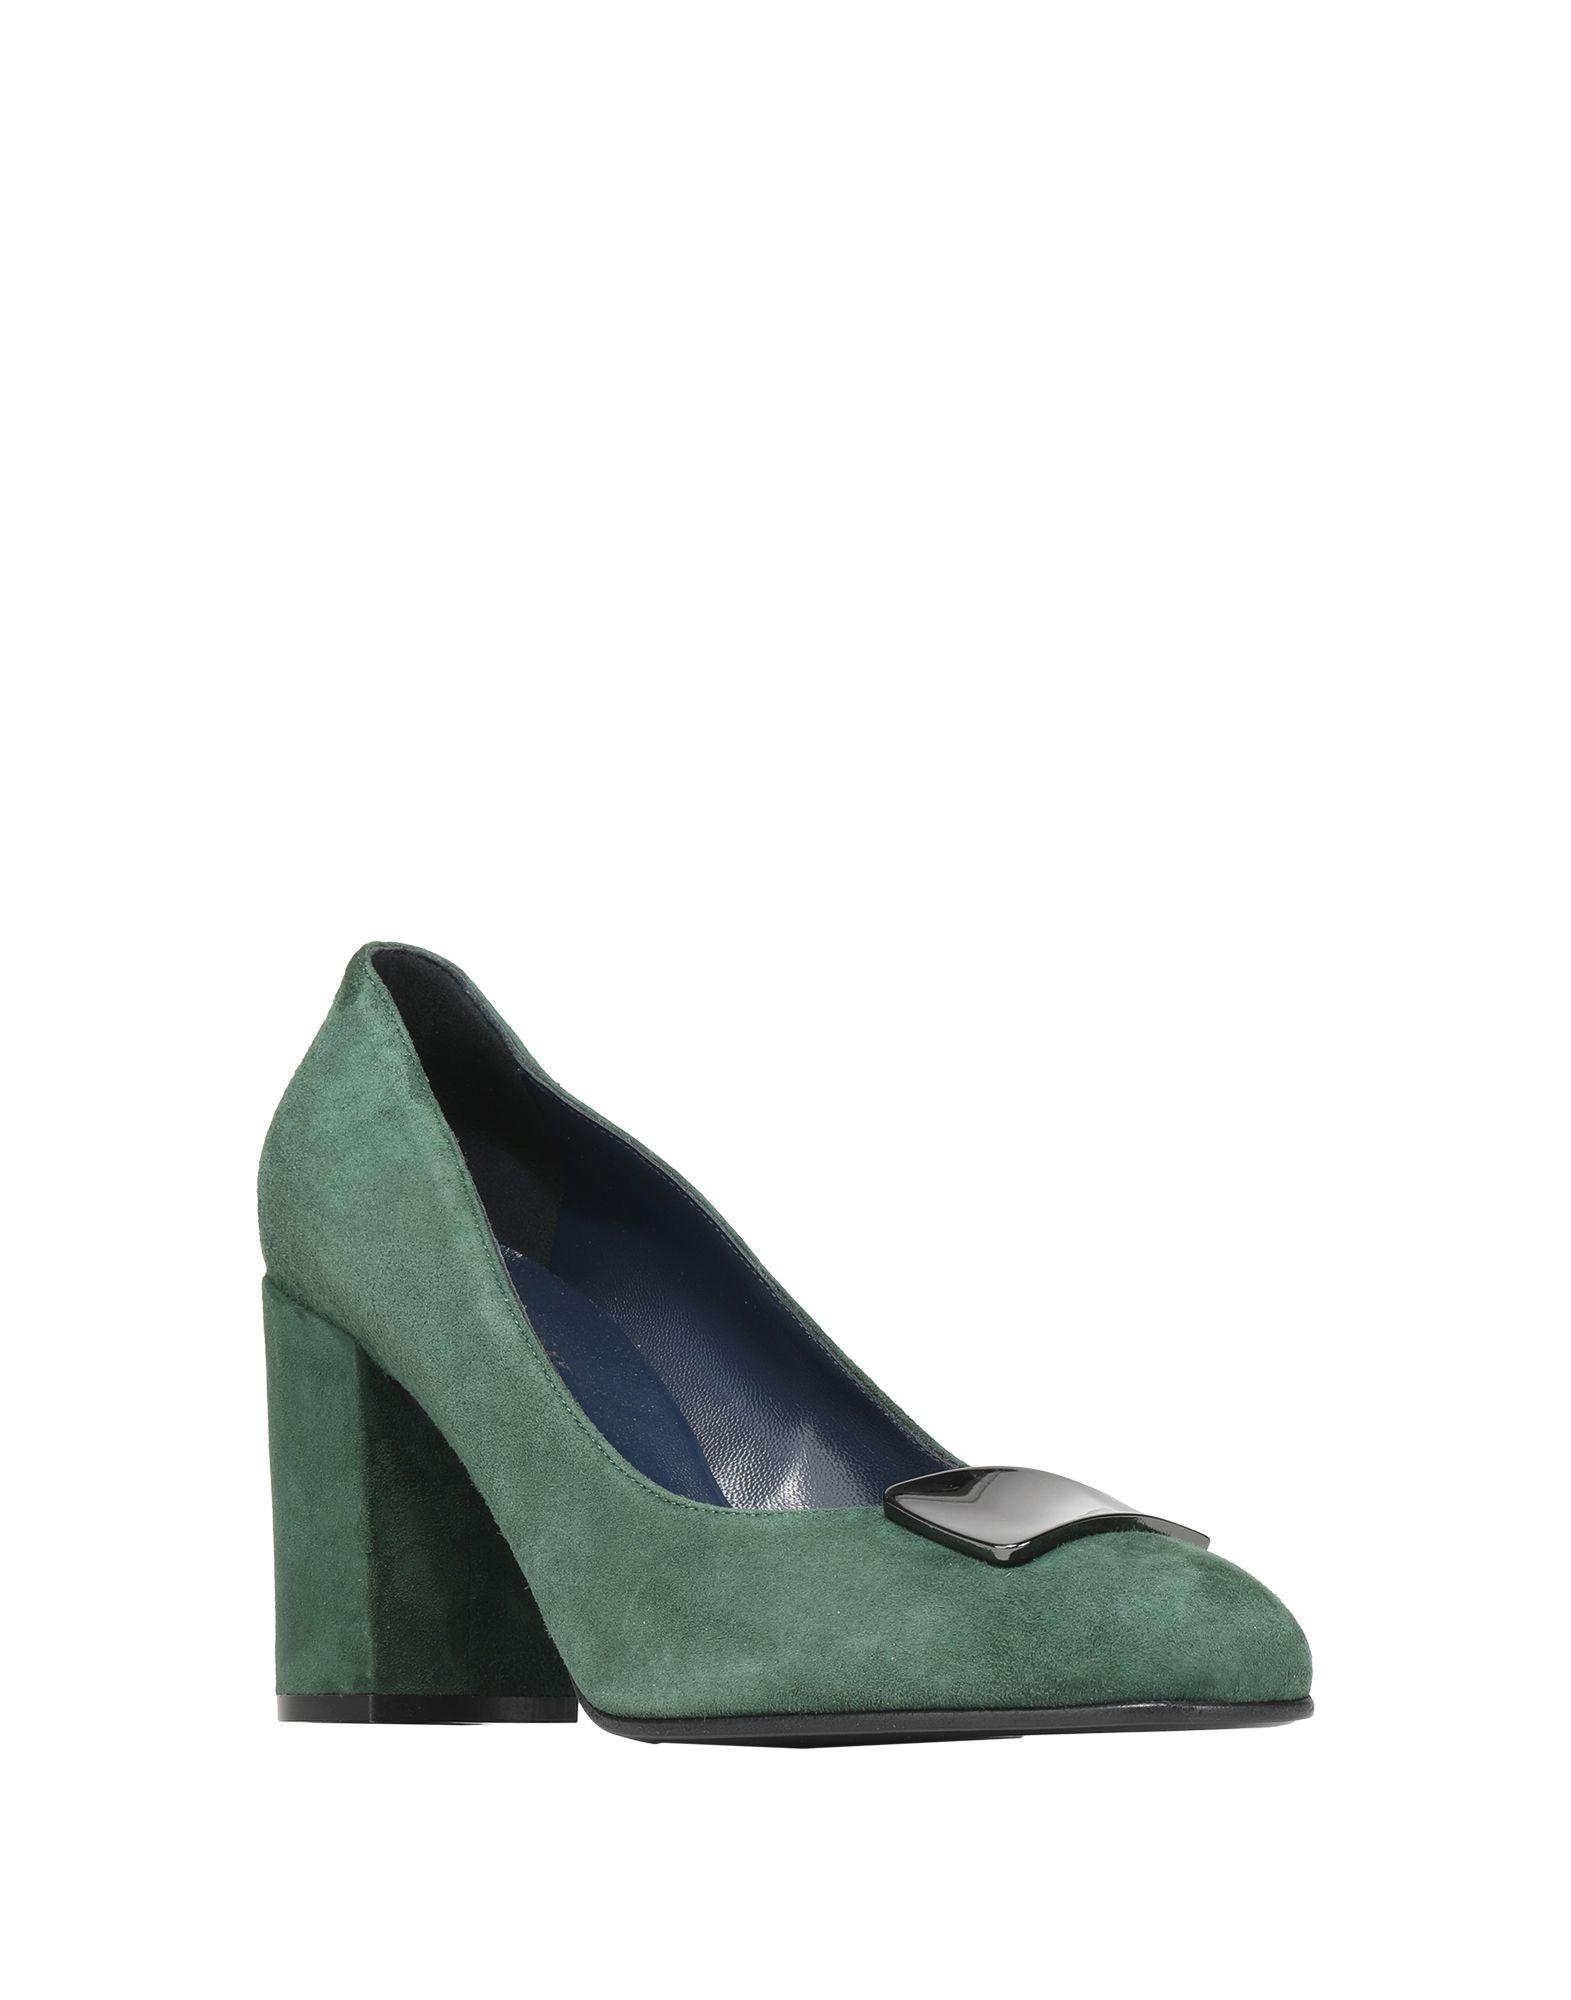 Stilvolle Damen billige Schuhe Pollini Pumps Damen Stilvolle  11538474CK 452d20